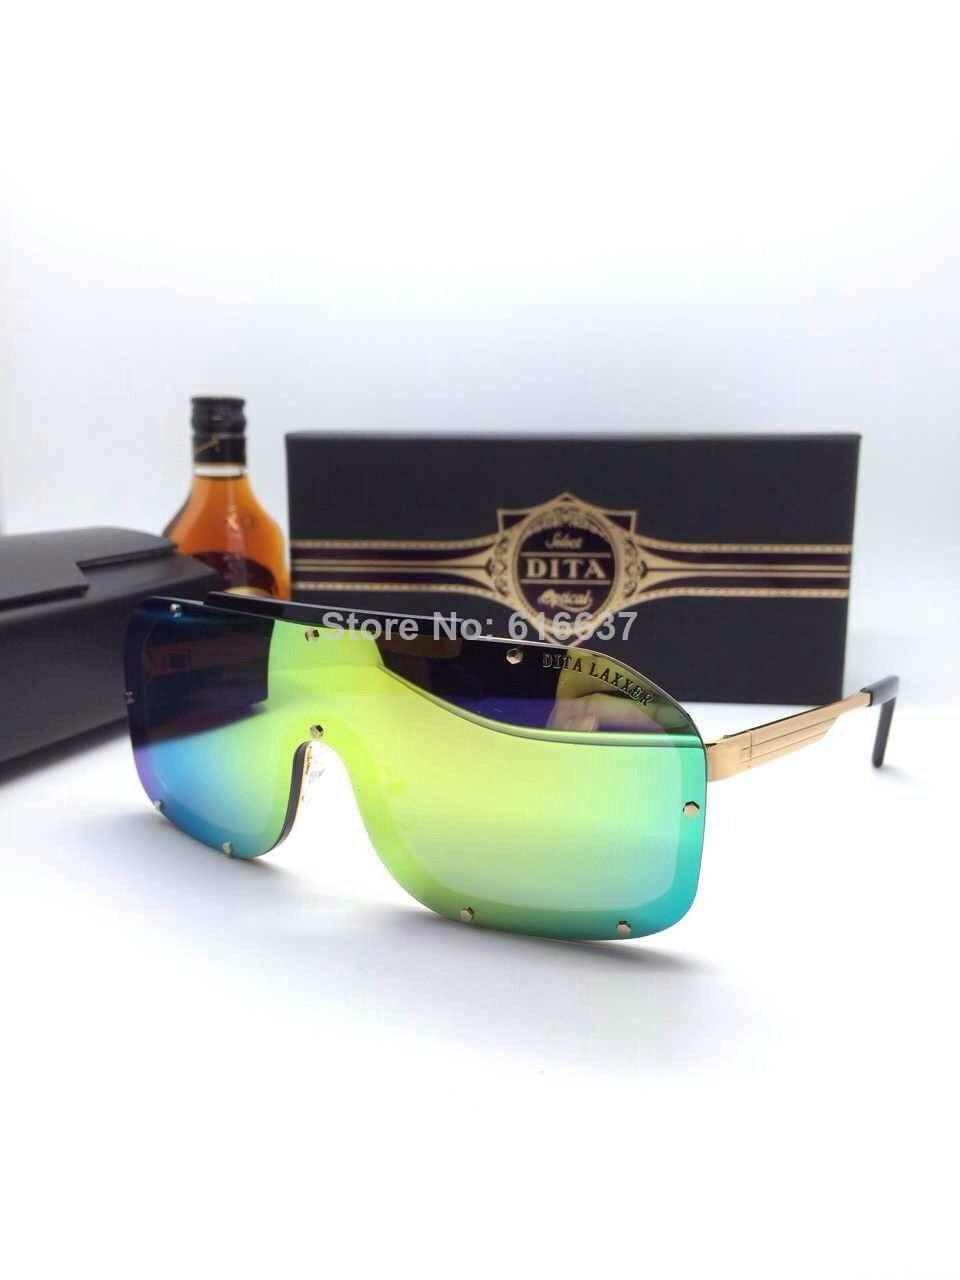 free shipping new arrive dita Iridescen mirror lense mask sunglasses wholesale